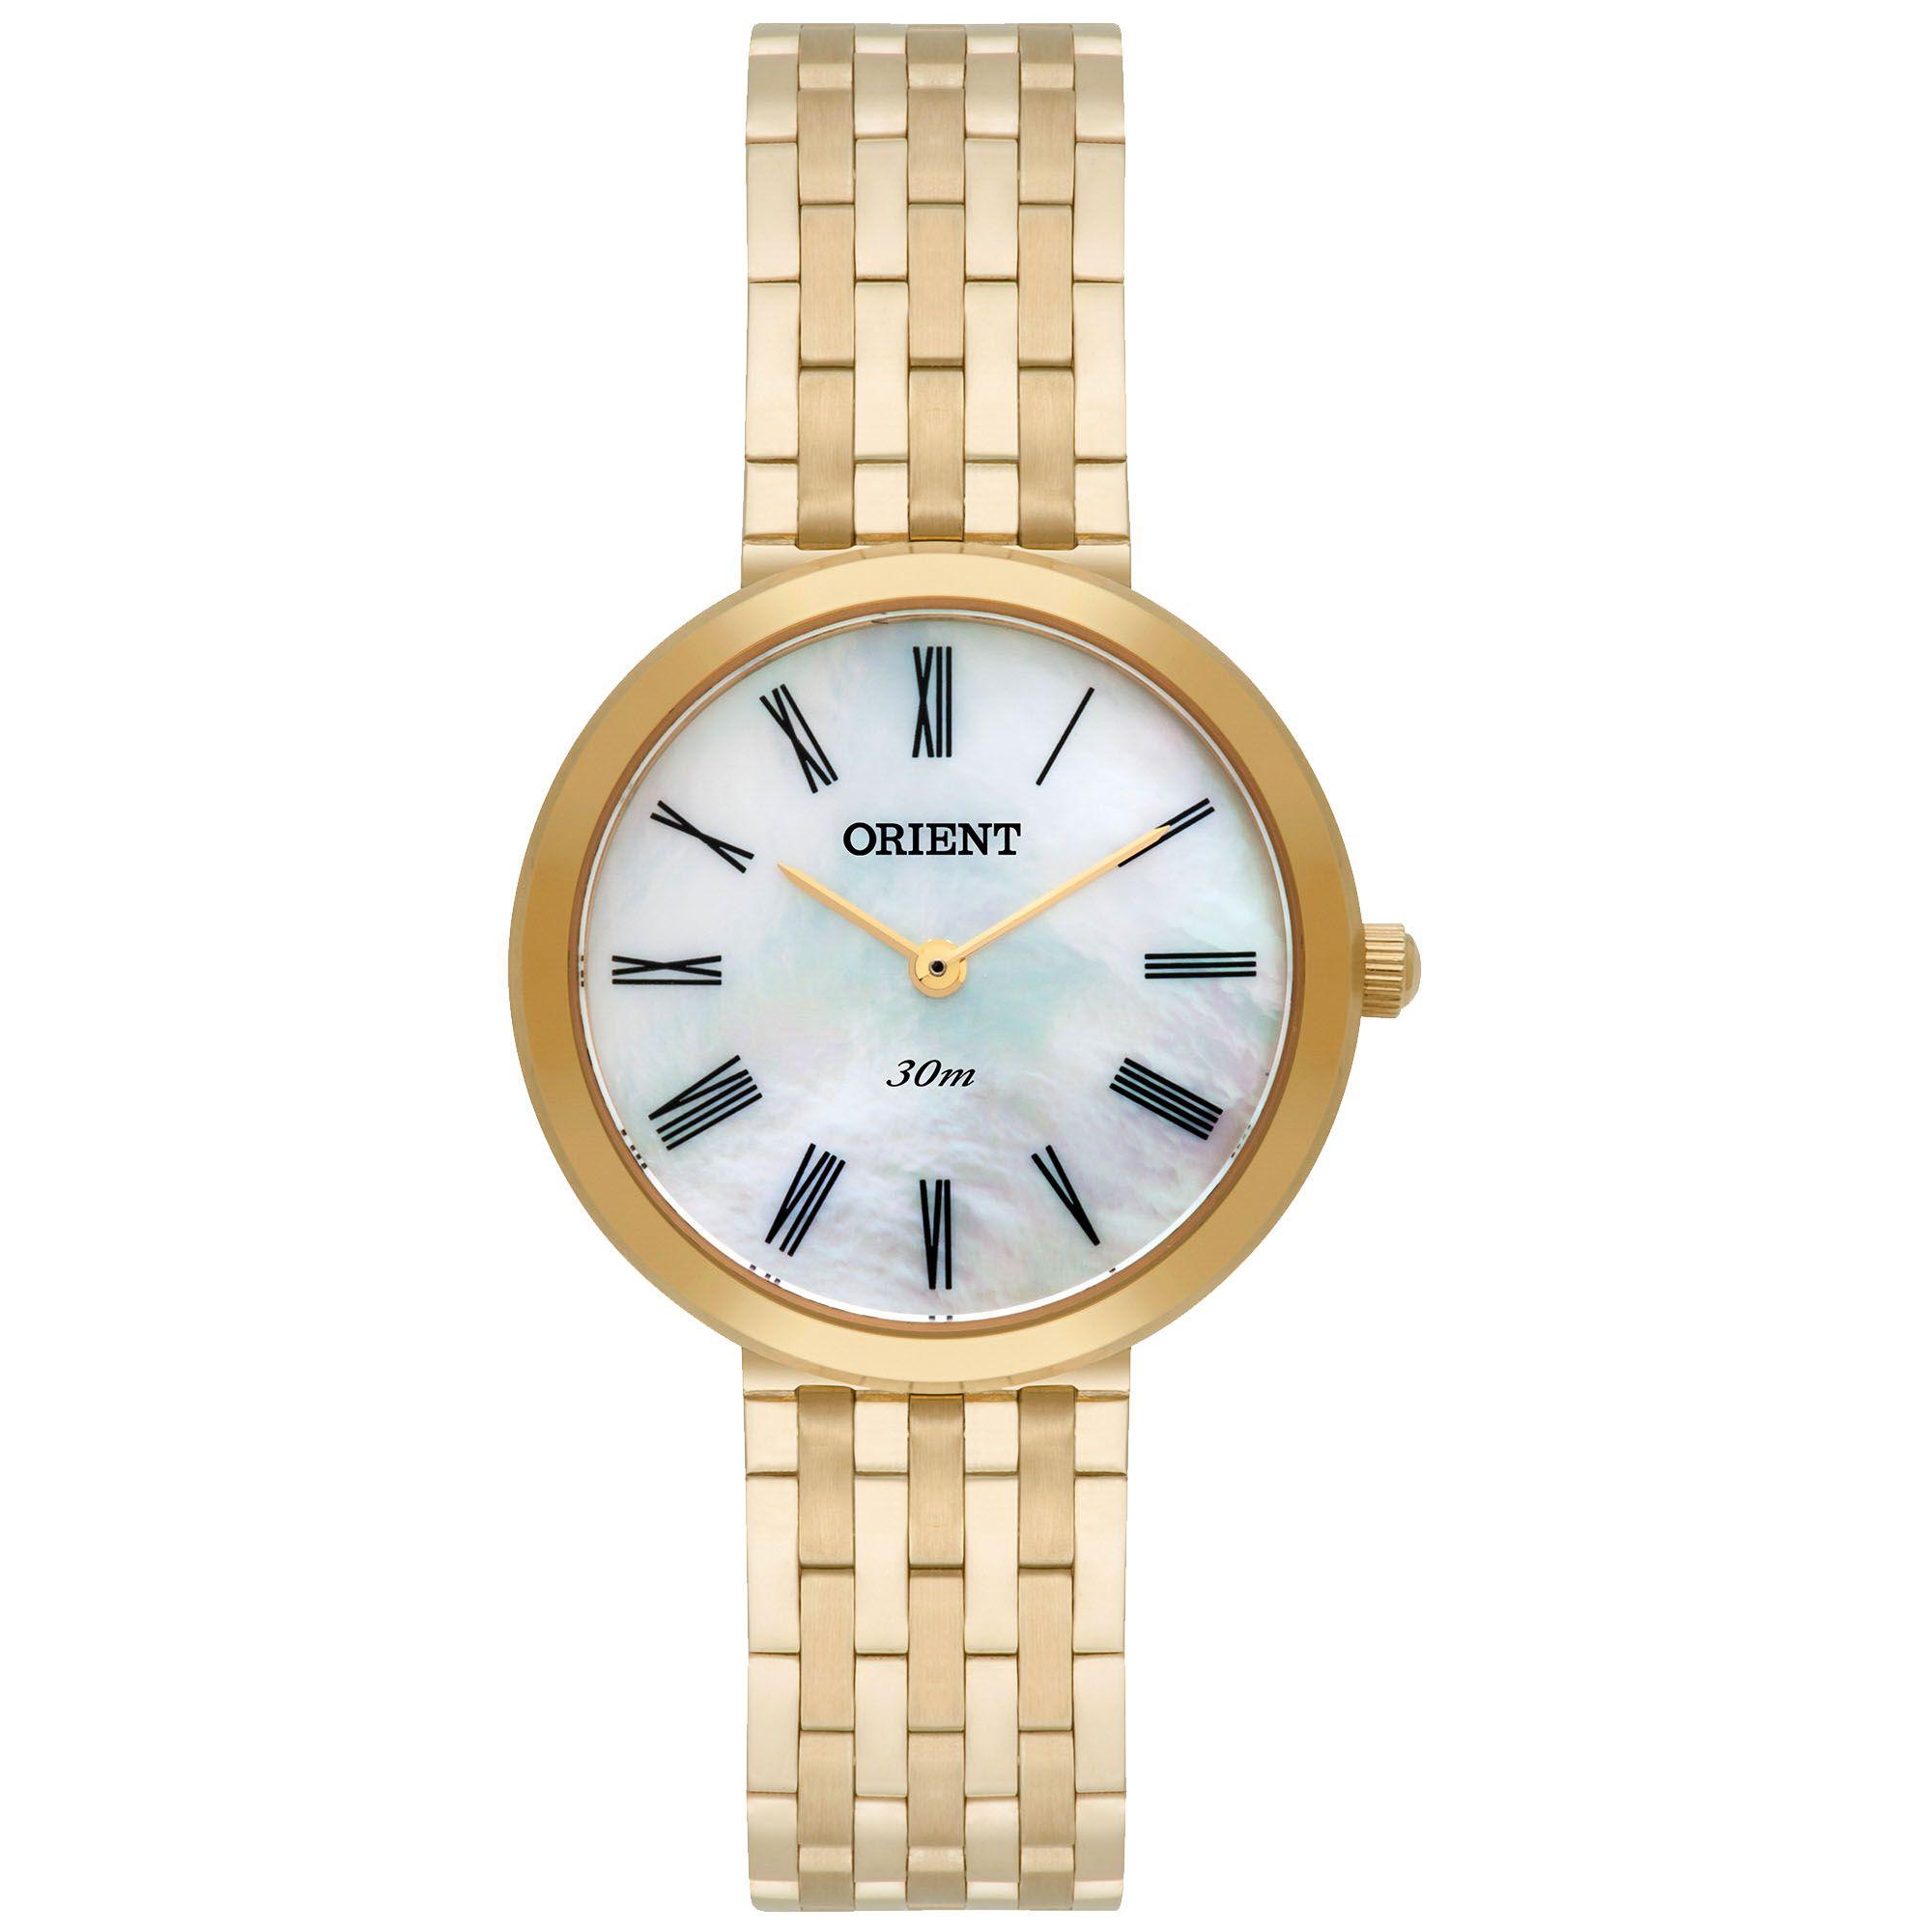 Relógio Feminino Orient FGSS0051 B3KX